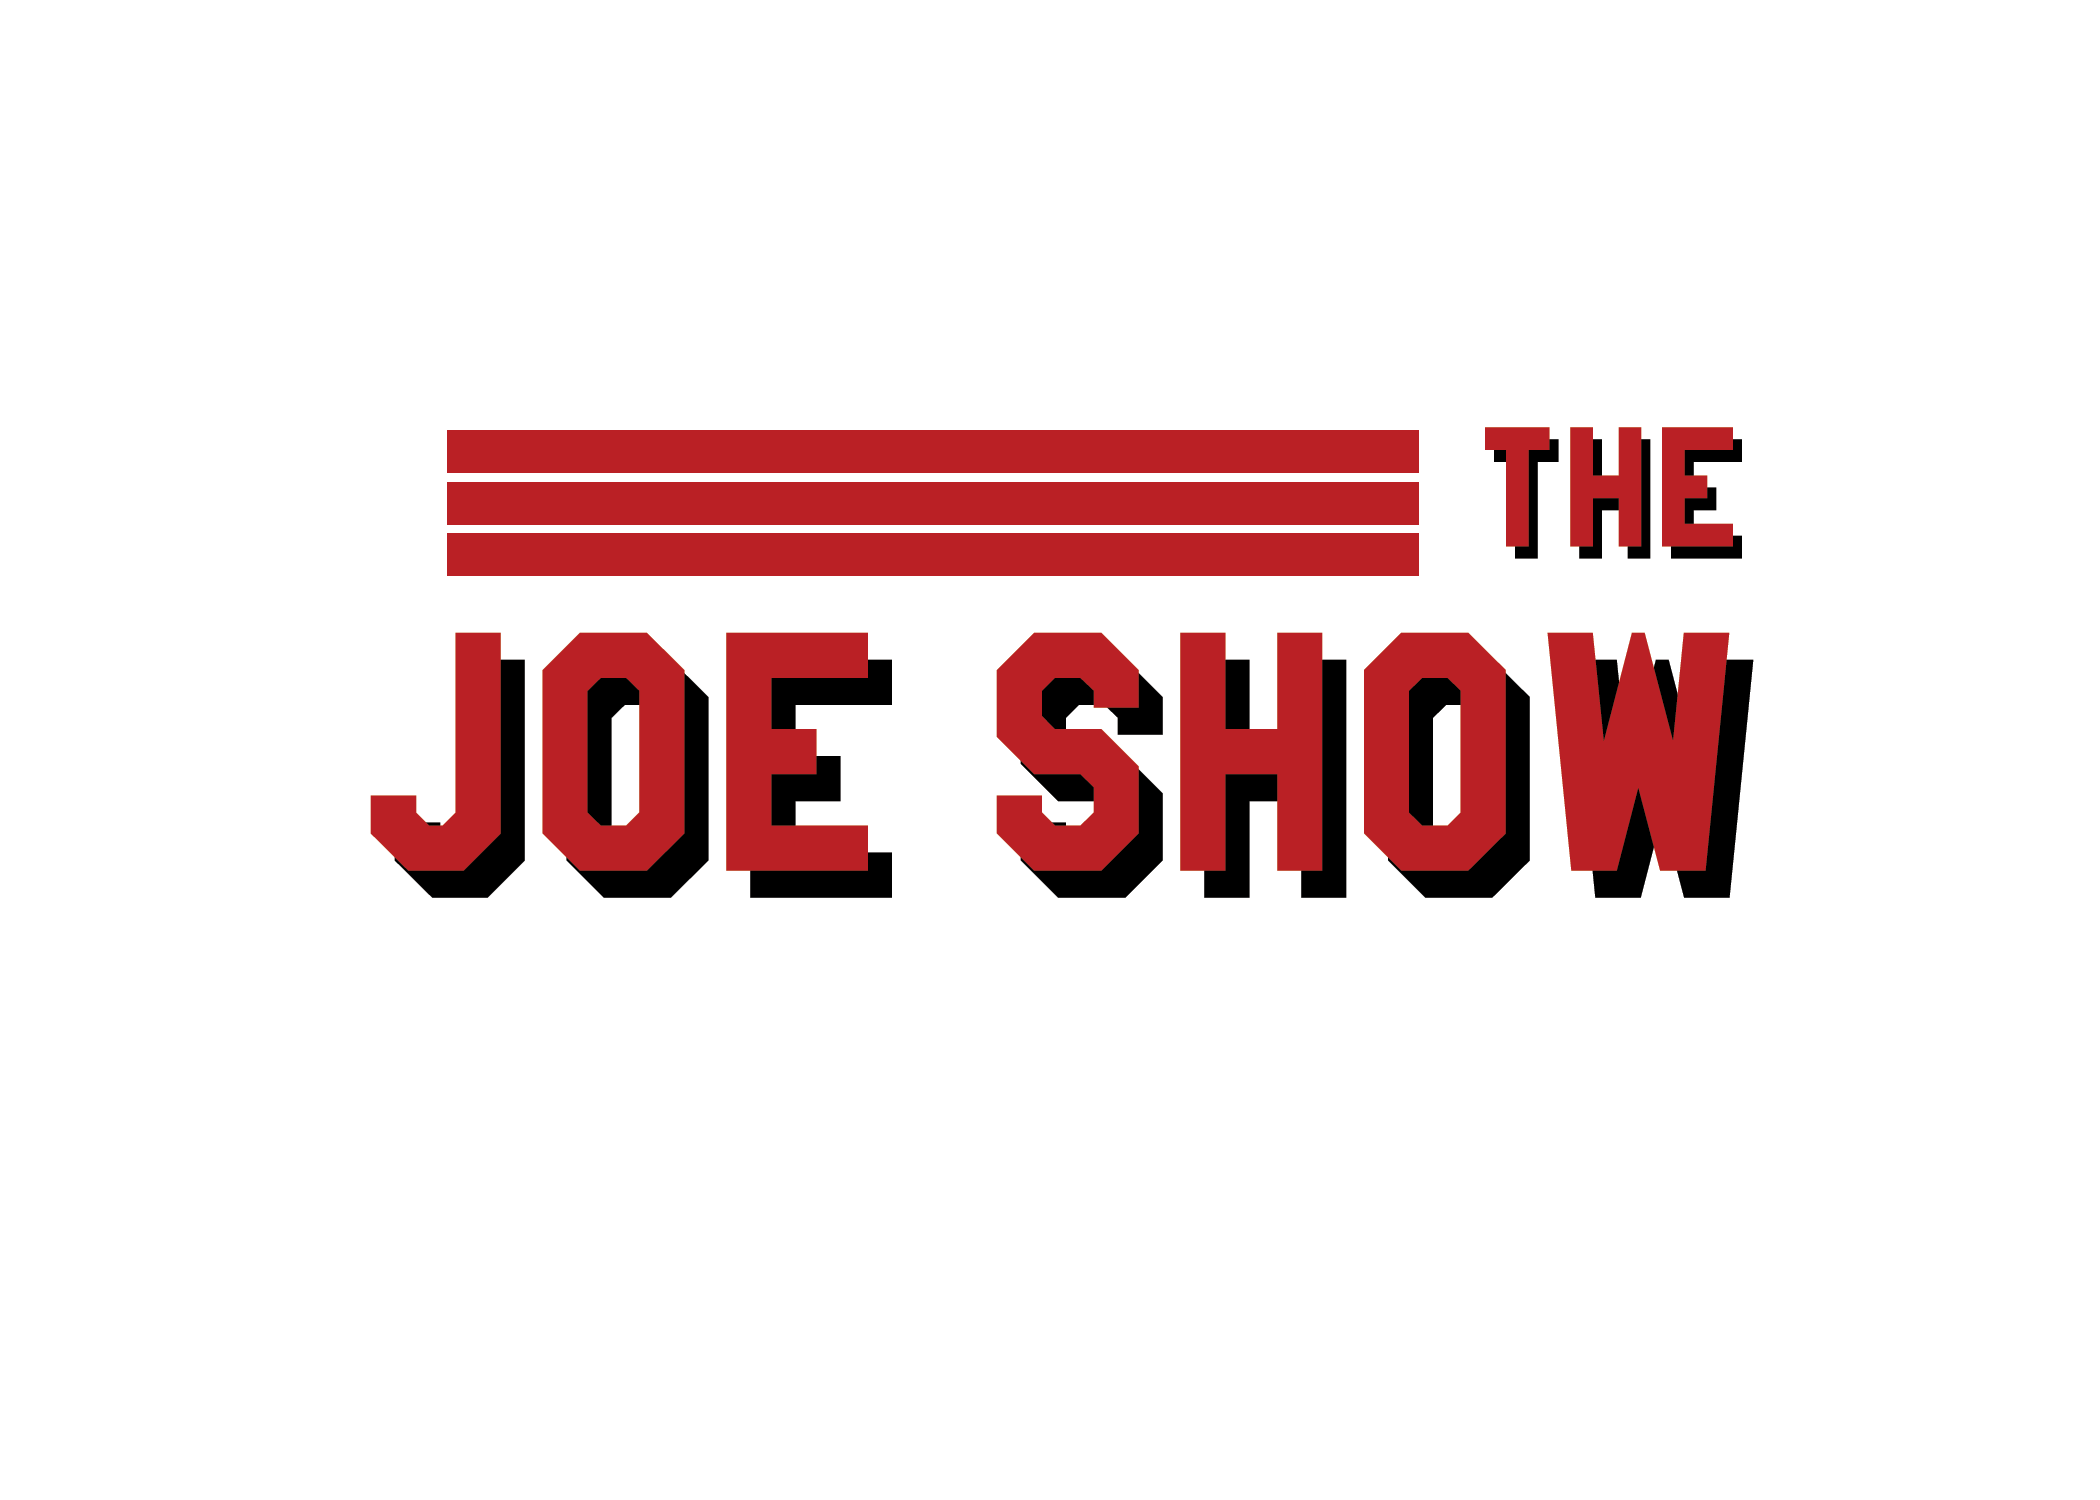 Joe-Show-high-school-sans.png